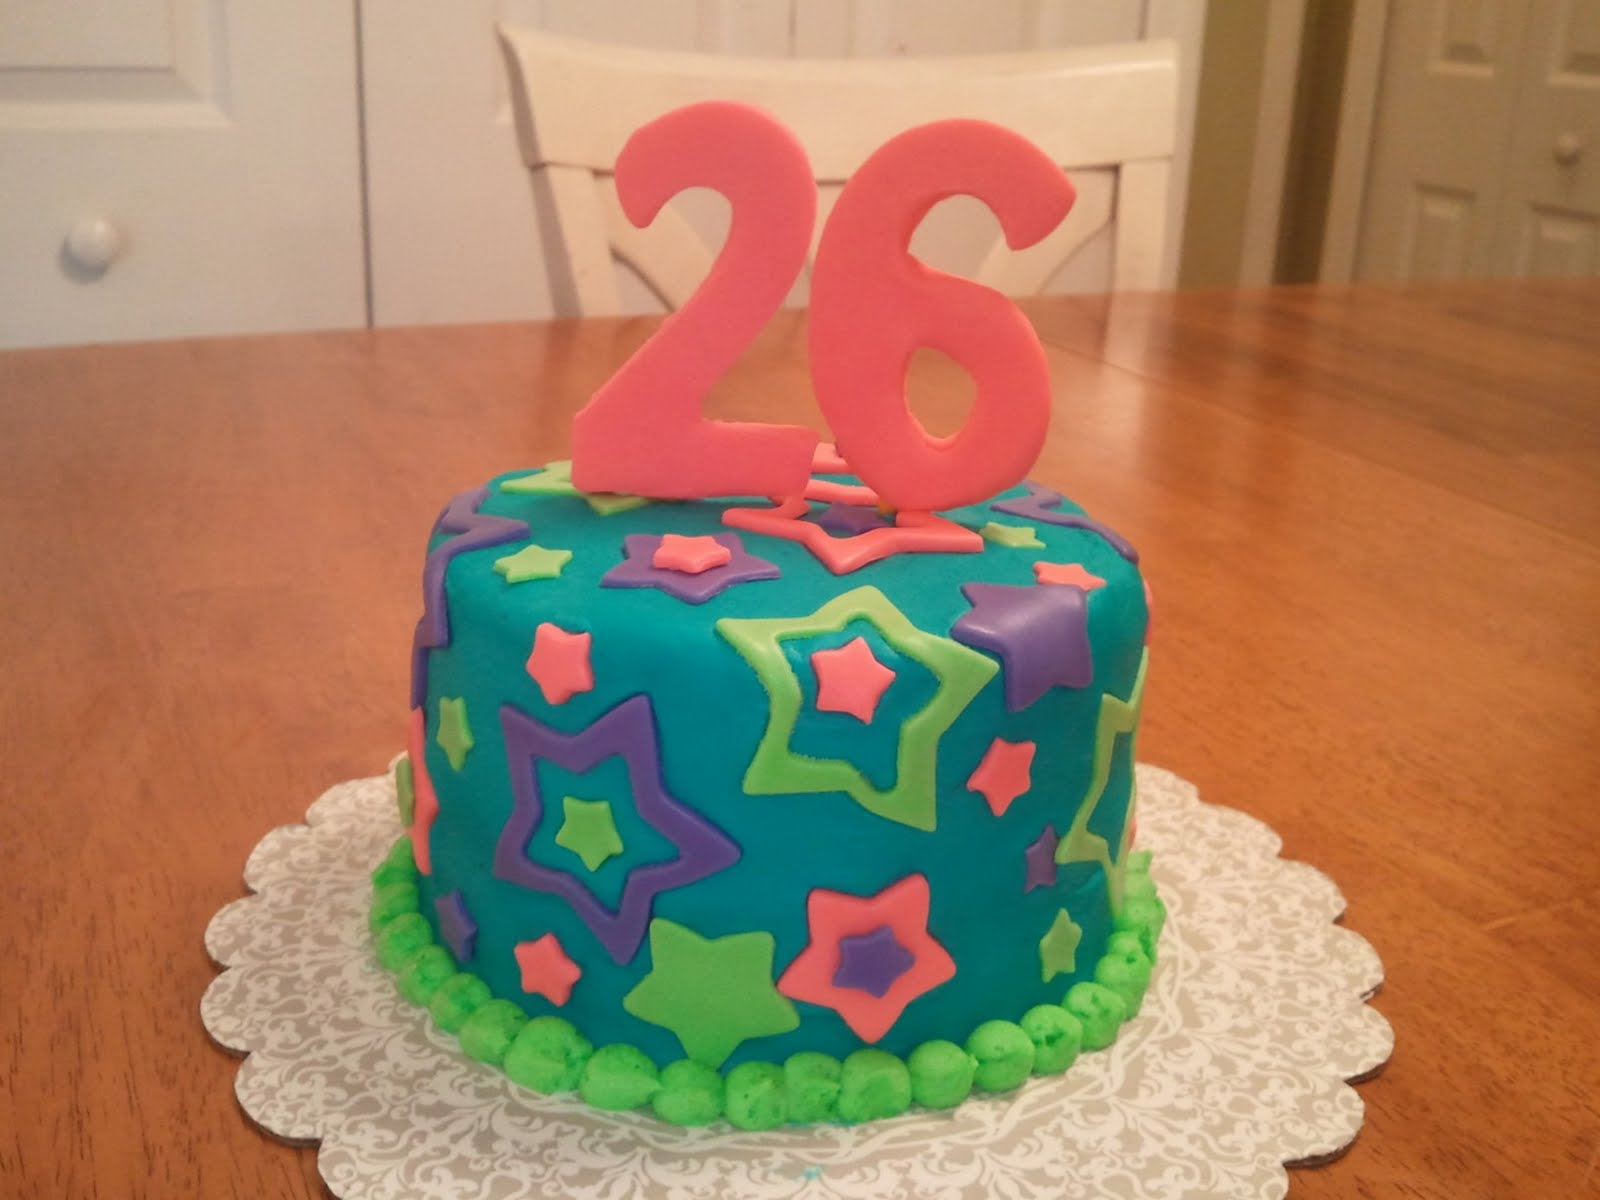 26Th Birthday Cakes